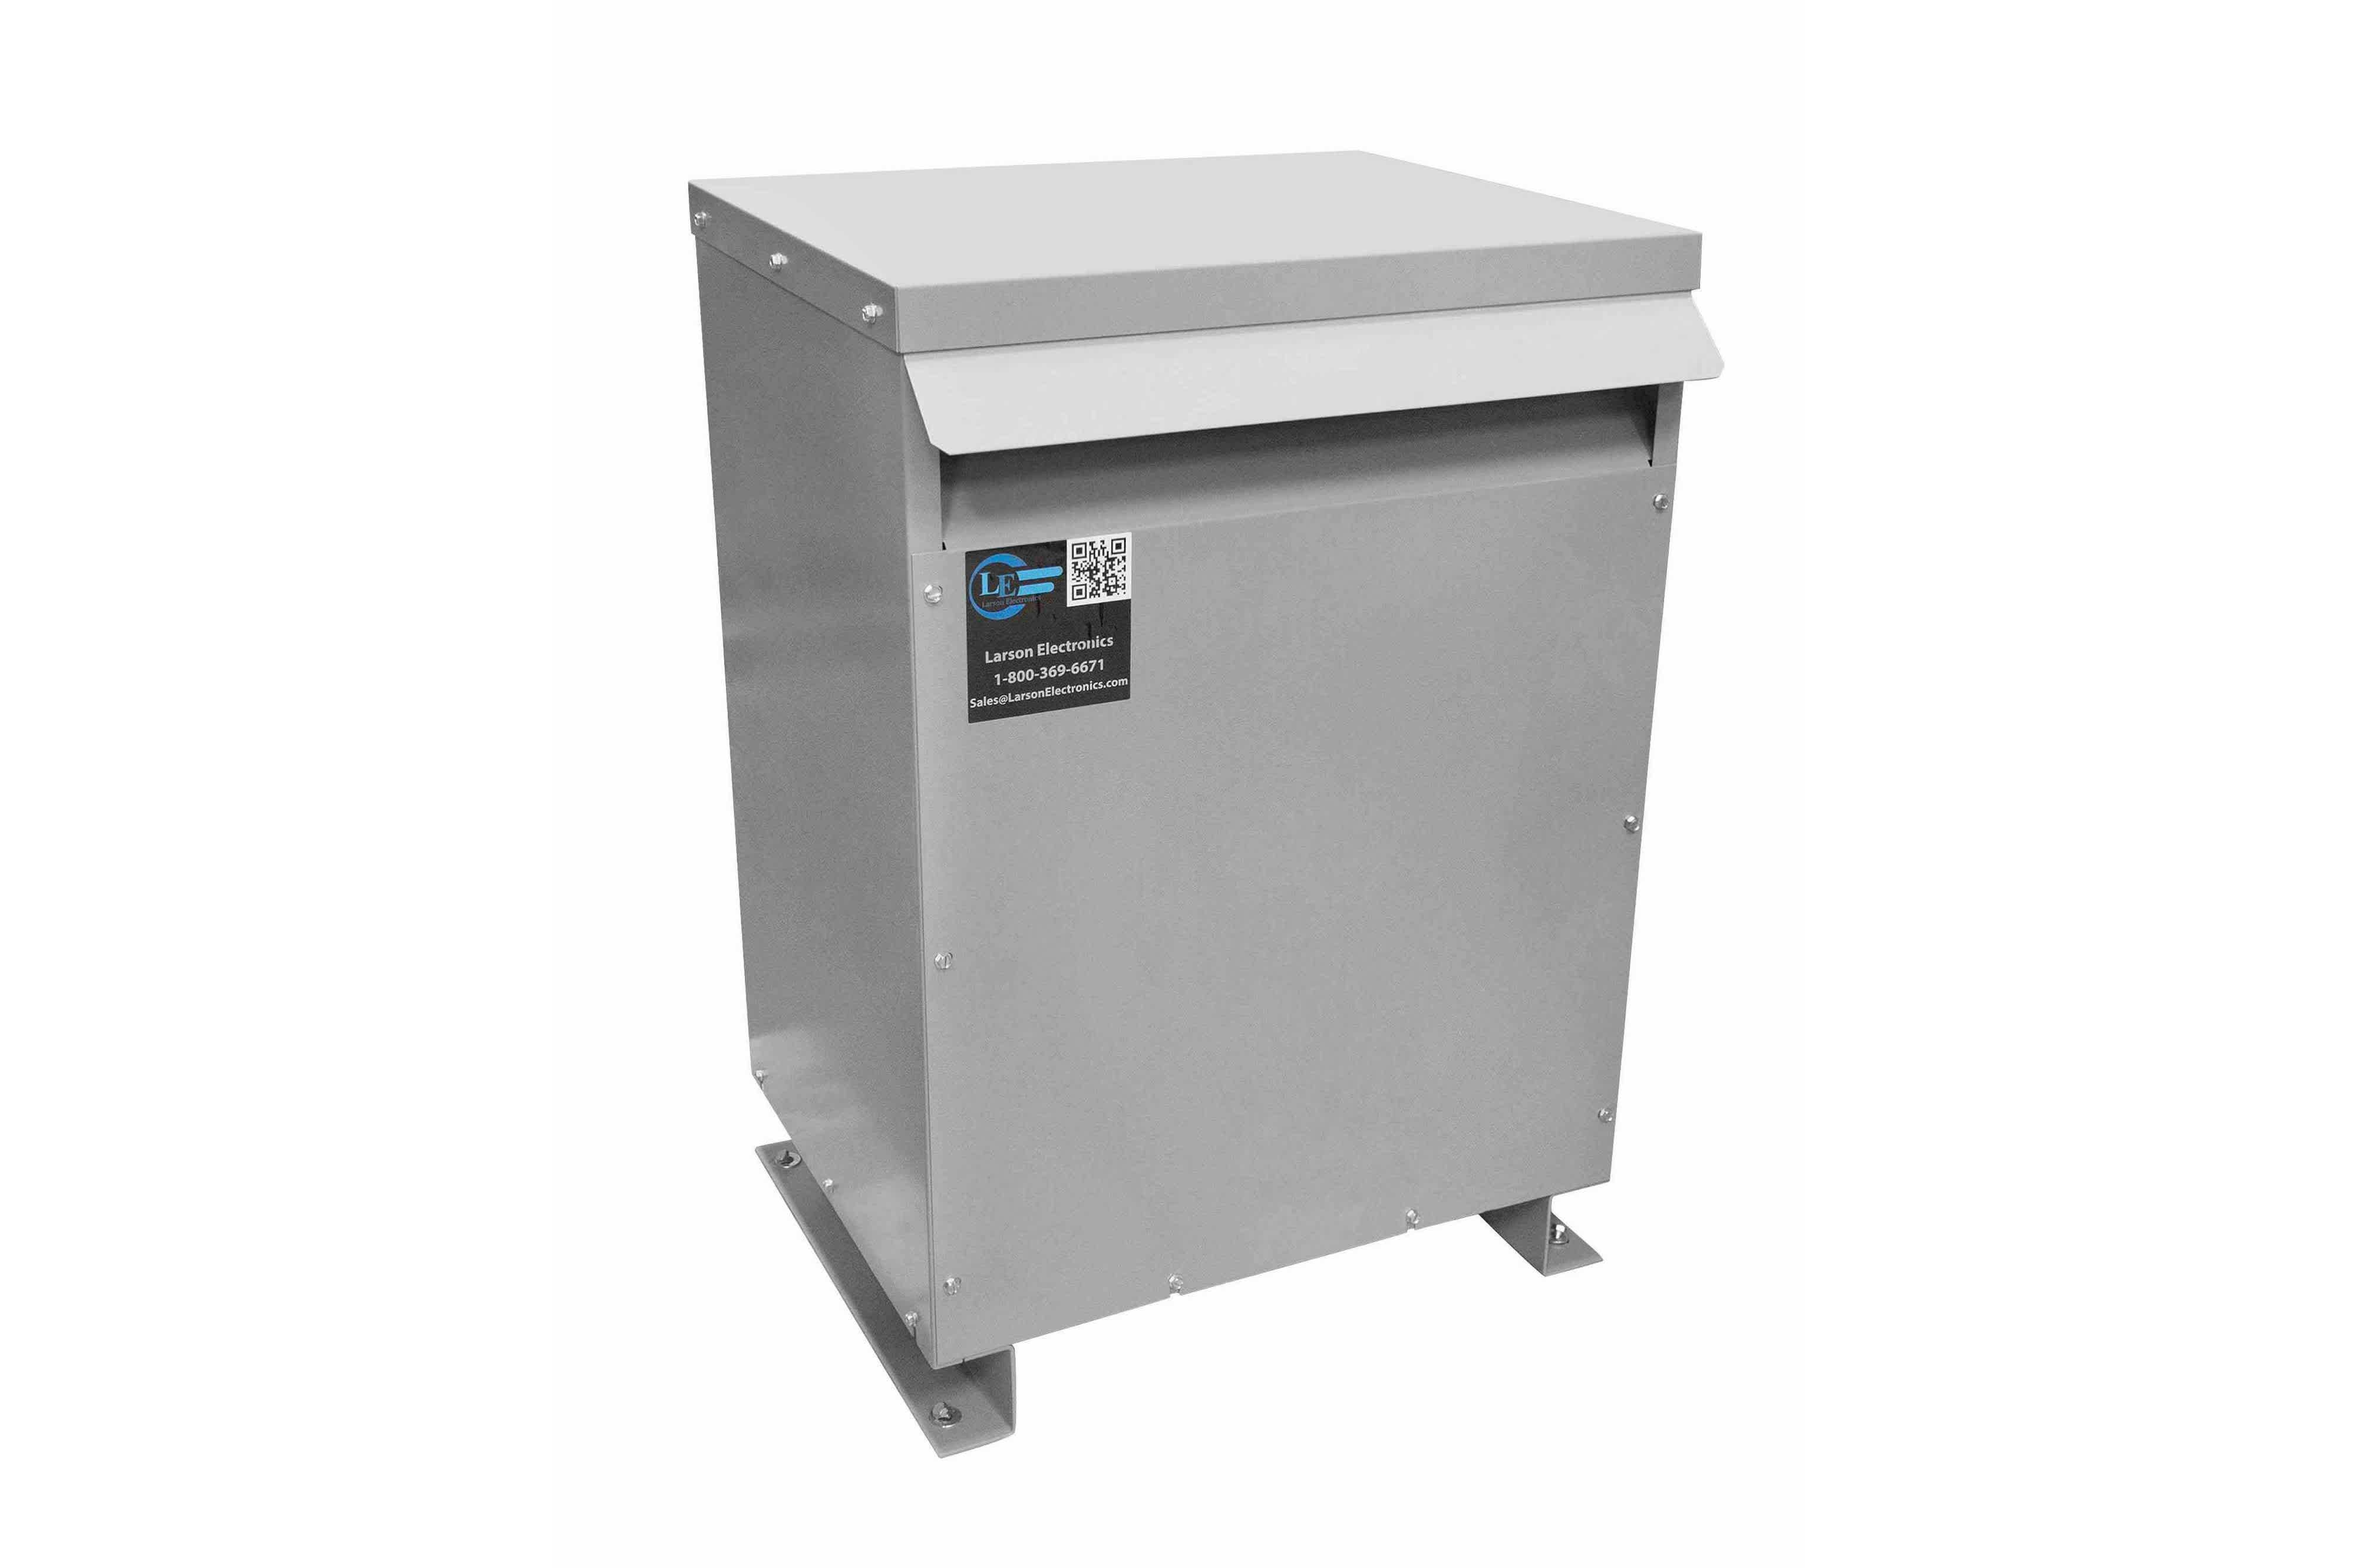 137.5 kVA 3PH Isolation Transformer, 600V Wye Primary, 400V Delta Secondary, N3R, Ventilated, 60 Hz